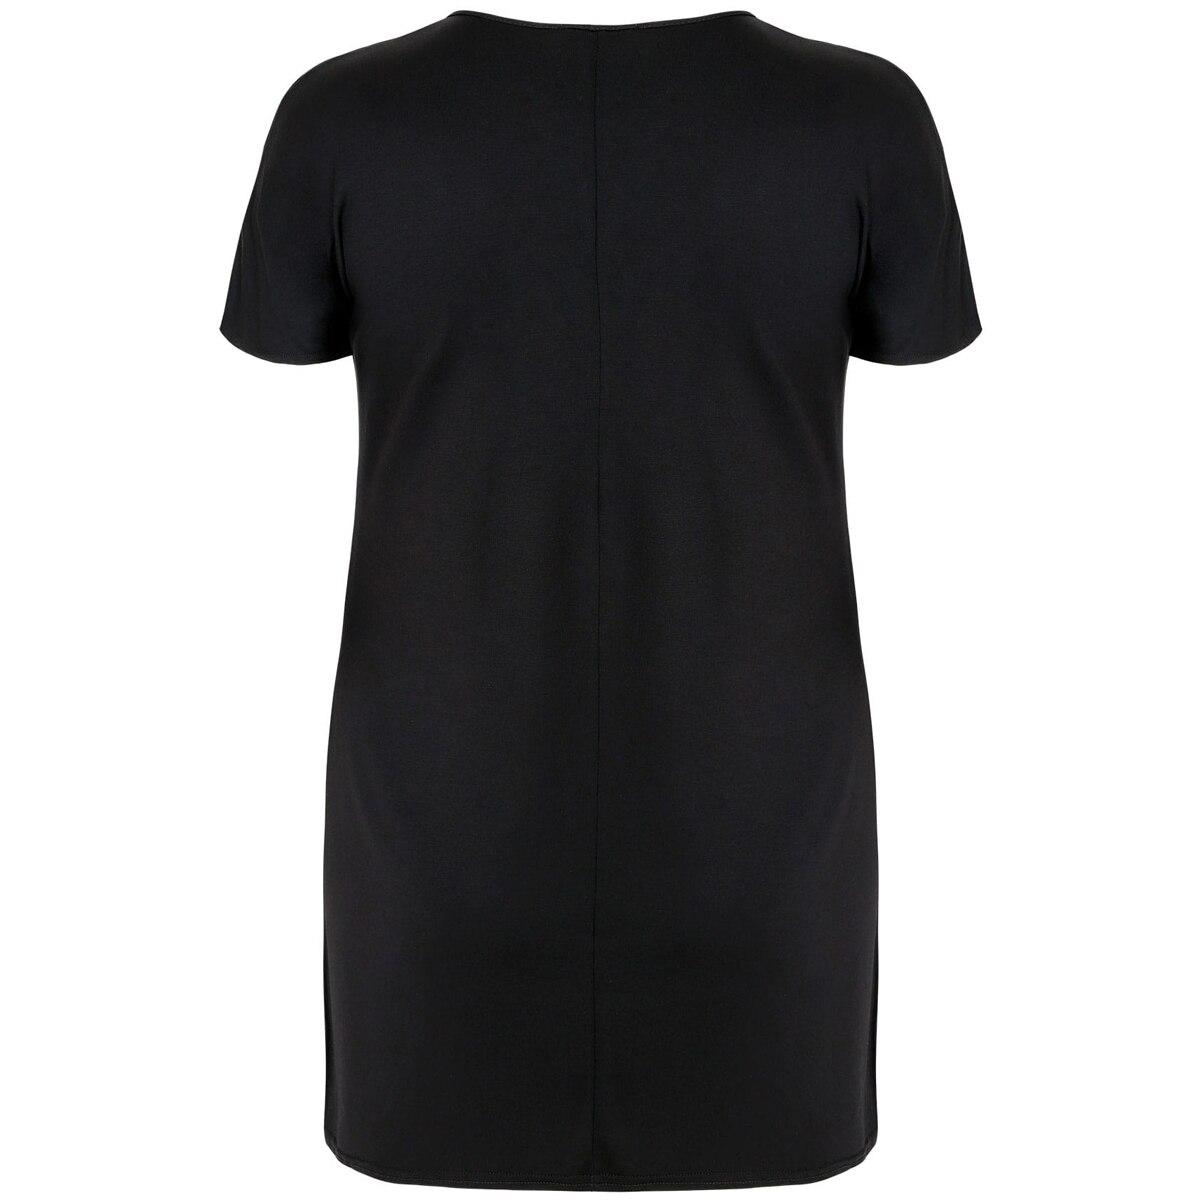 5c247311489 Kissmilk Women Plus Size Floral Print Mini Punk T shirt Dress Cut Out Short  Sleeve Club Party Dress Large Size Dress 3XL 7XL-in Dresses from Women s ...